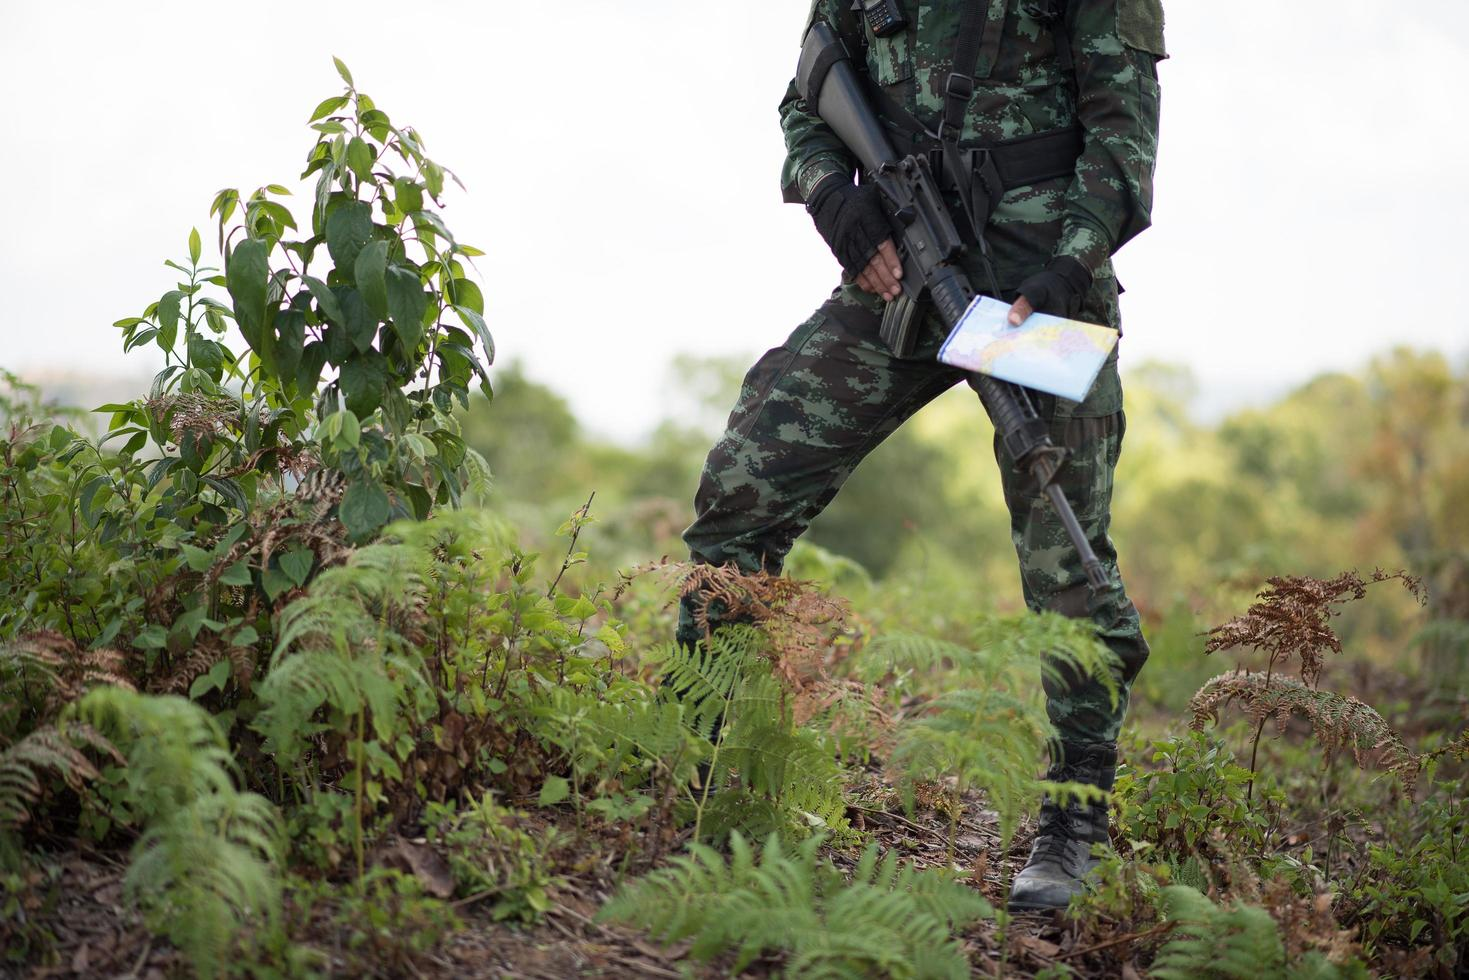 Soldat bereit mit Waffe foto